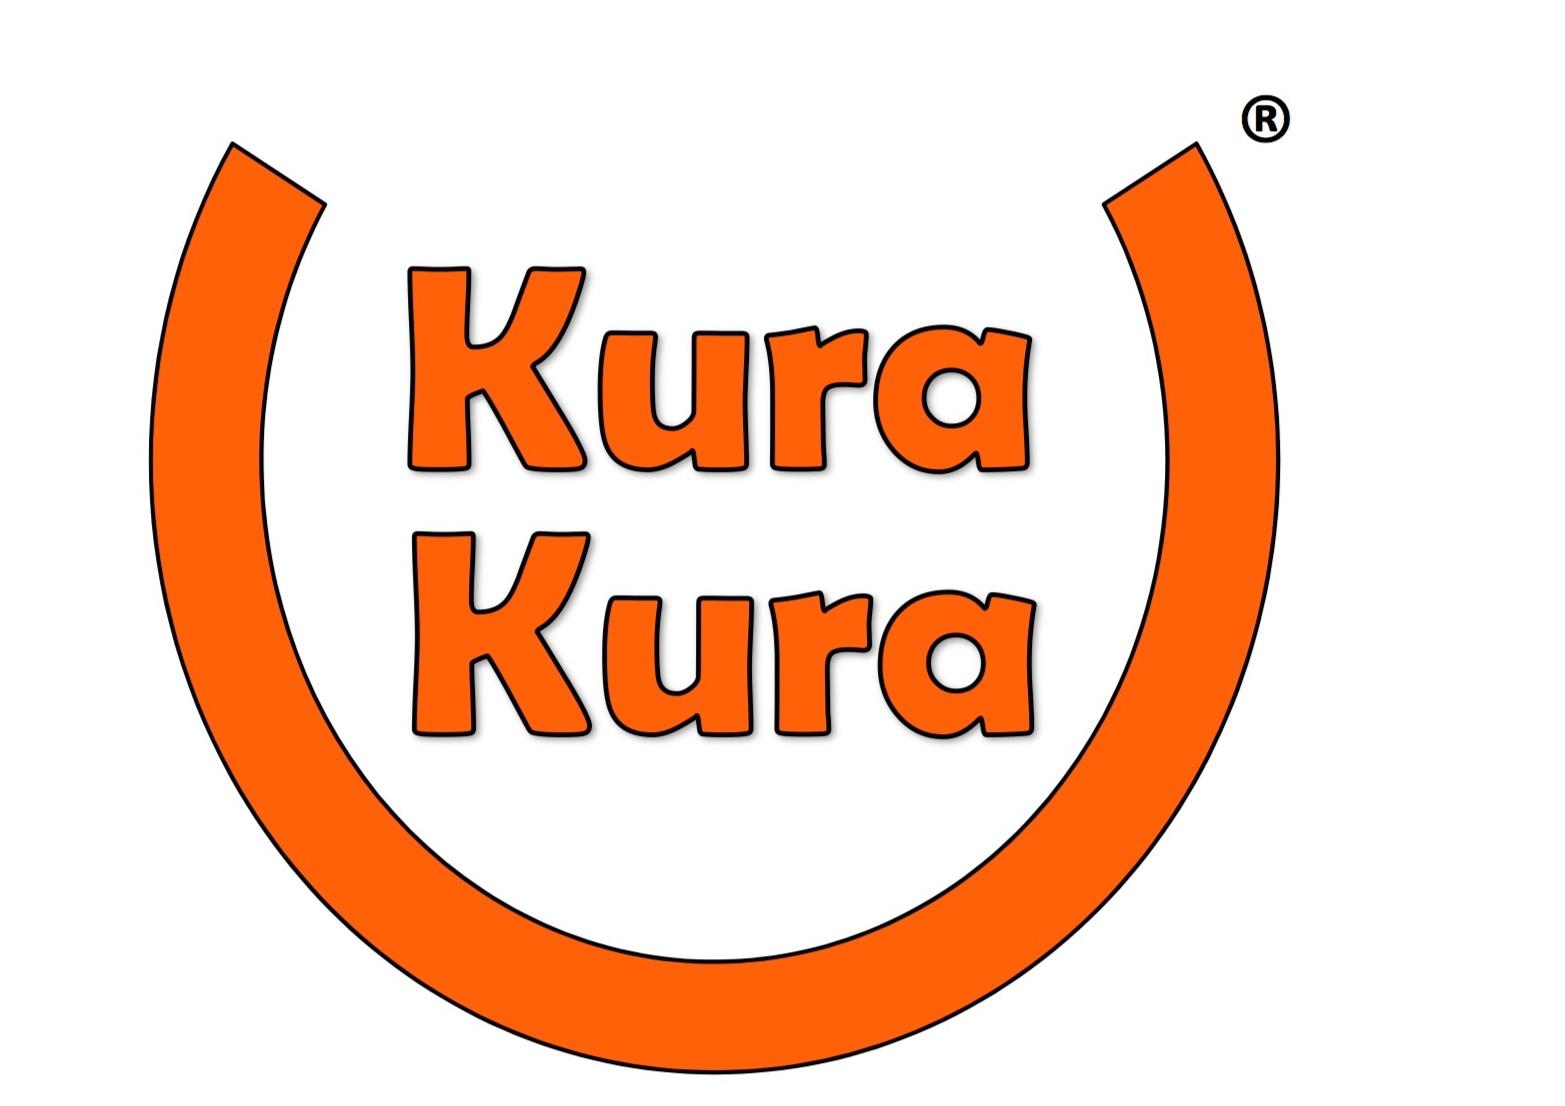 Kura+Kura+Logo+.jpg